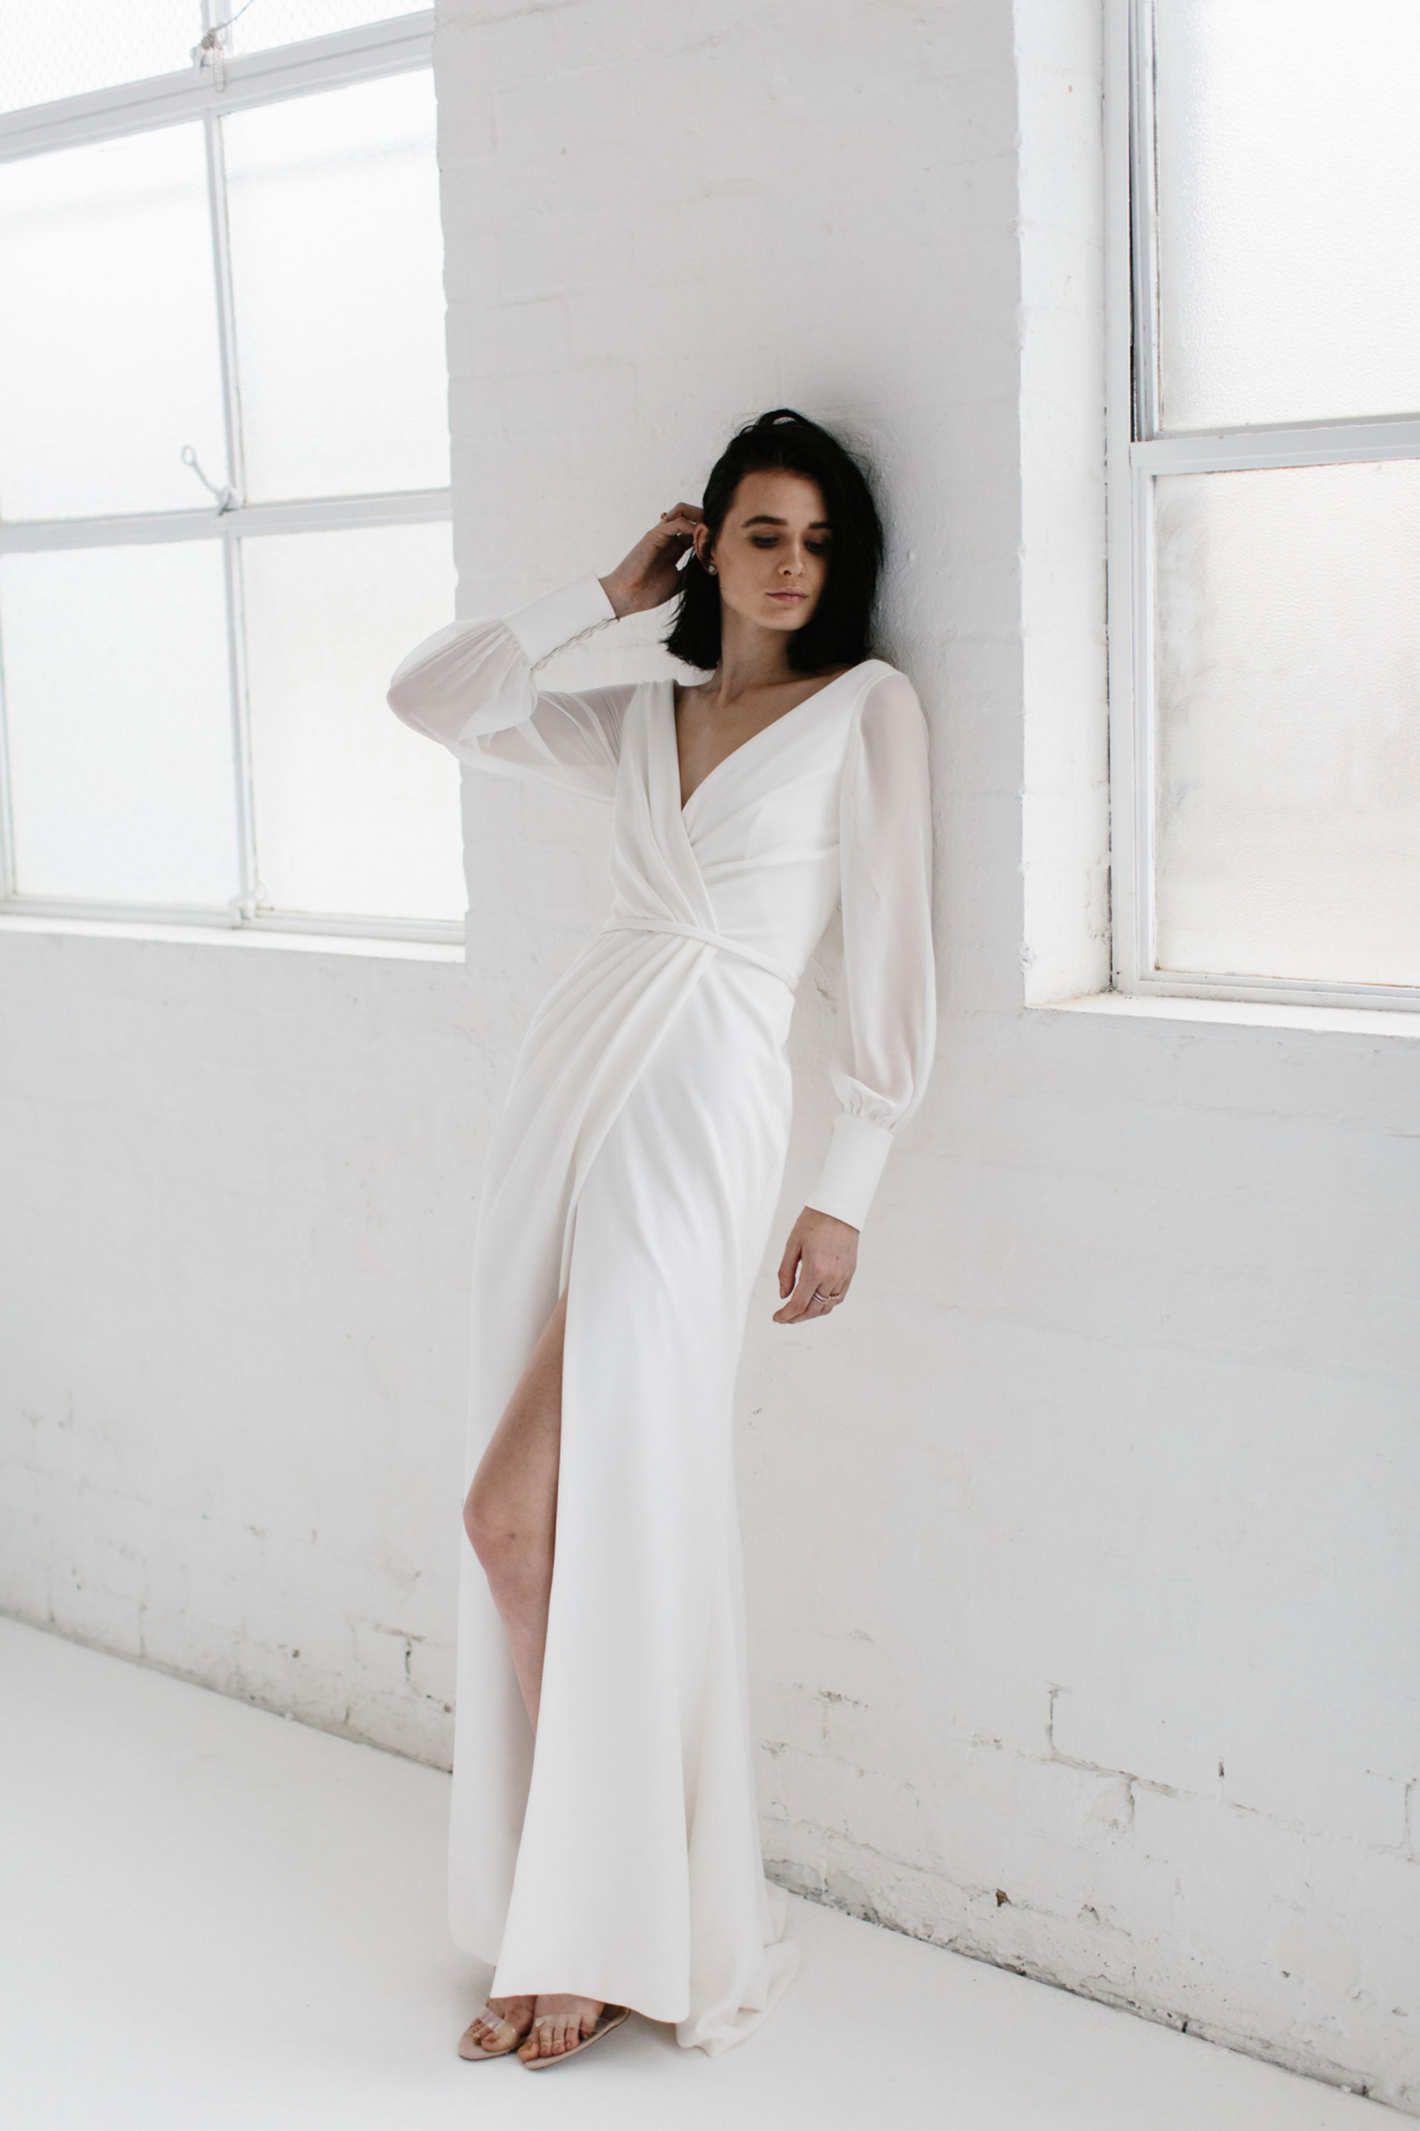 7a71d8391efef 23 Elegant Long-Sleeve Wedding Dresses for Winter Weddings